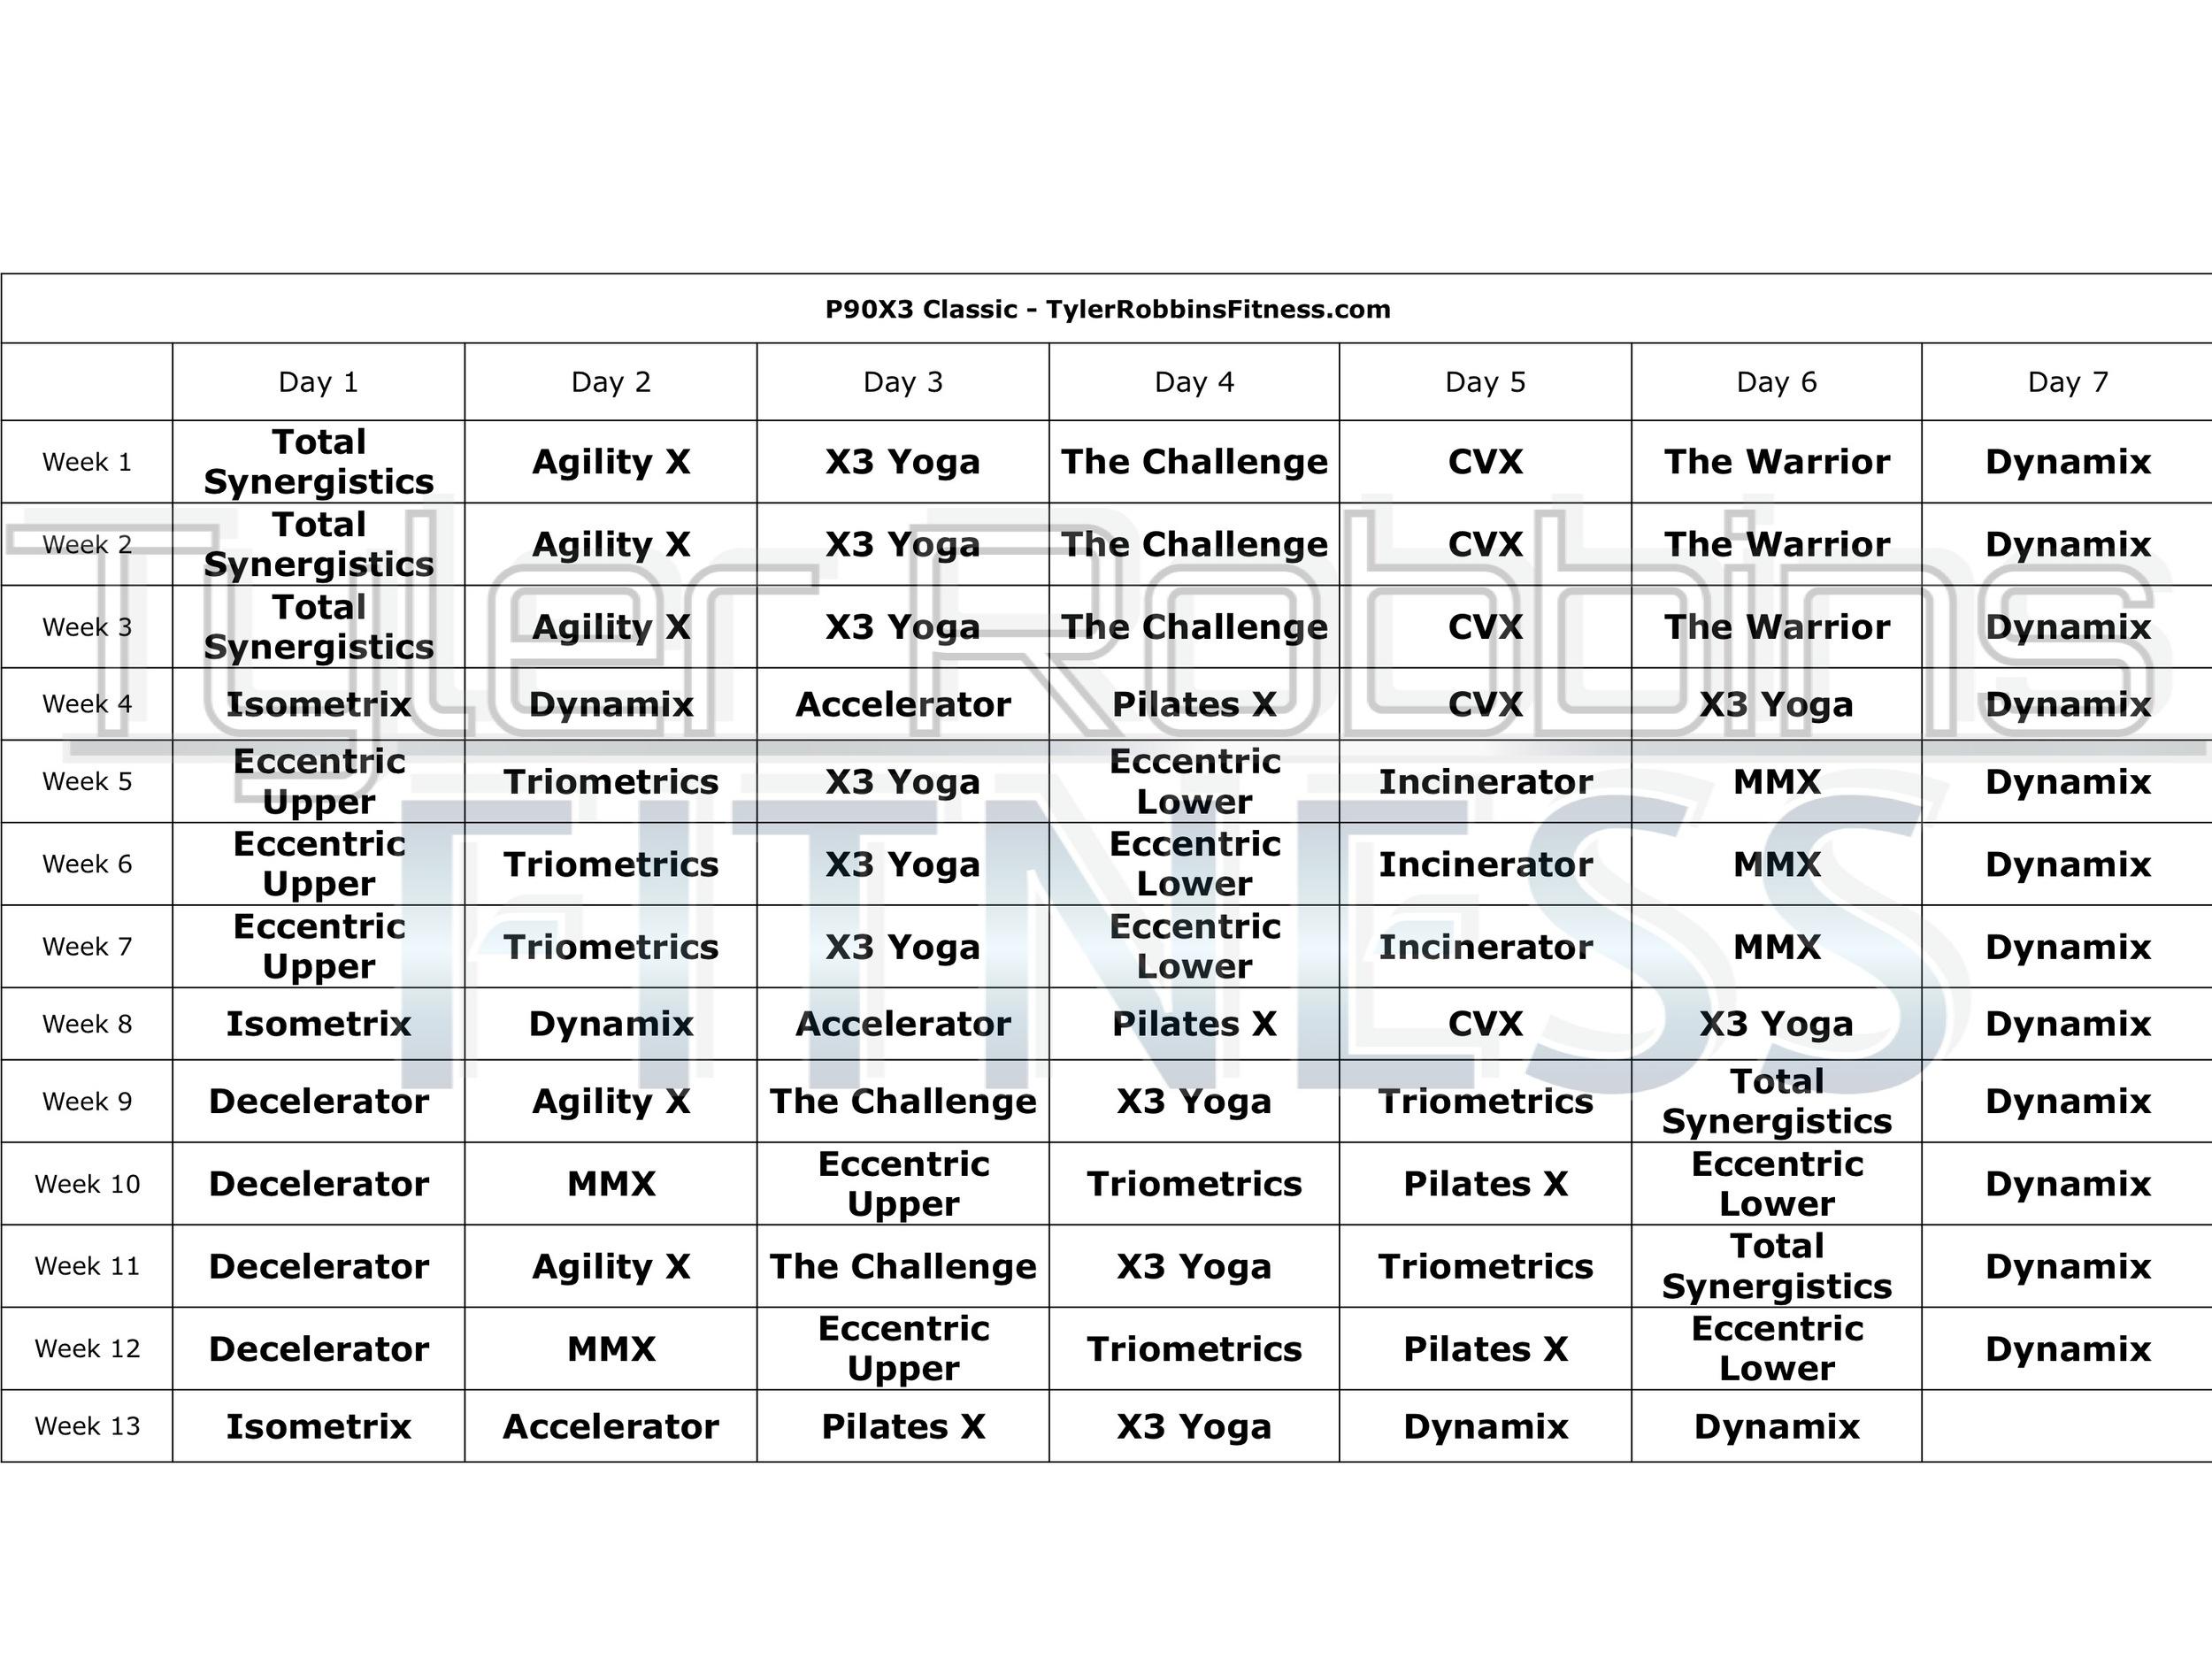 P90X3 Schedules — Tyler Robbins Fitness